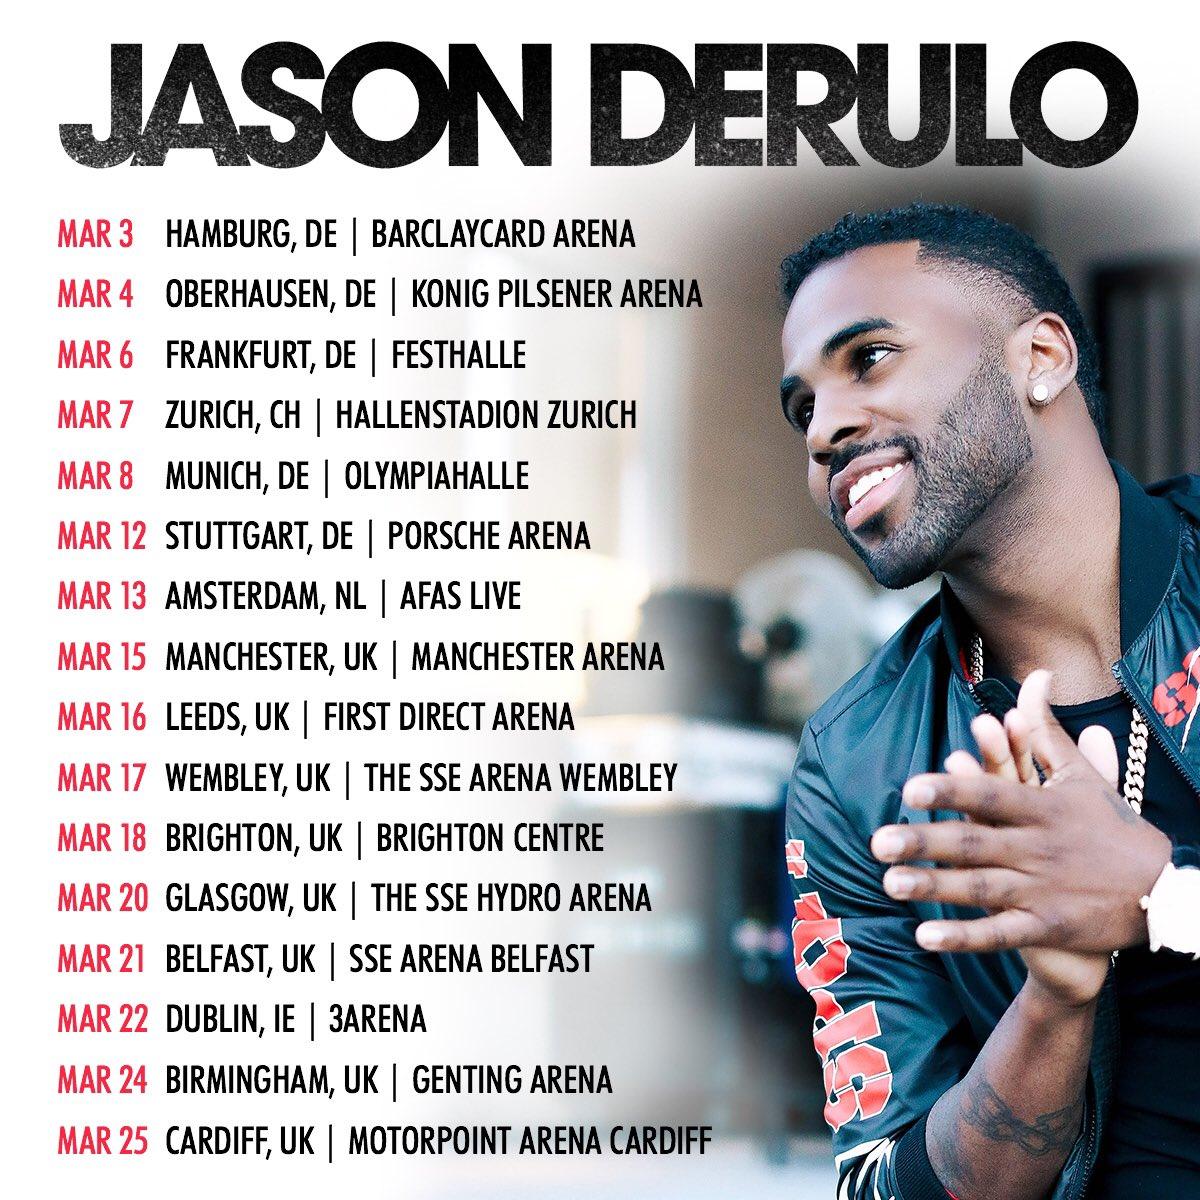 Jason Derulo Concert Tour